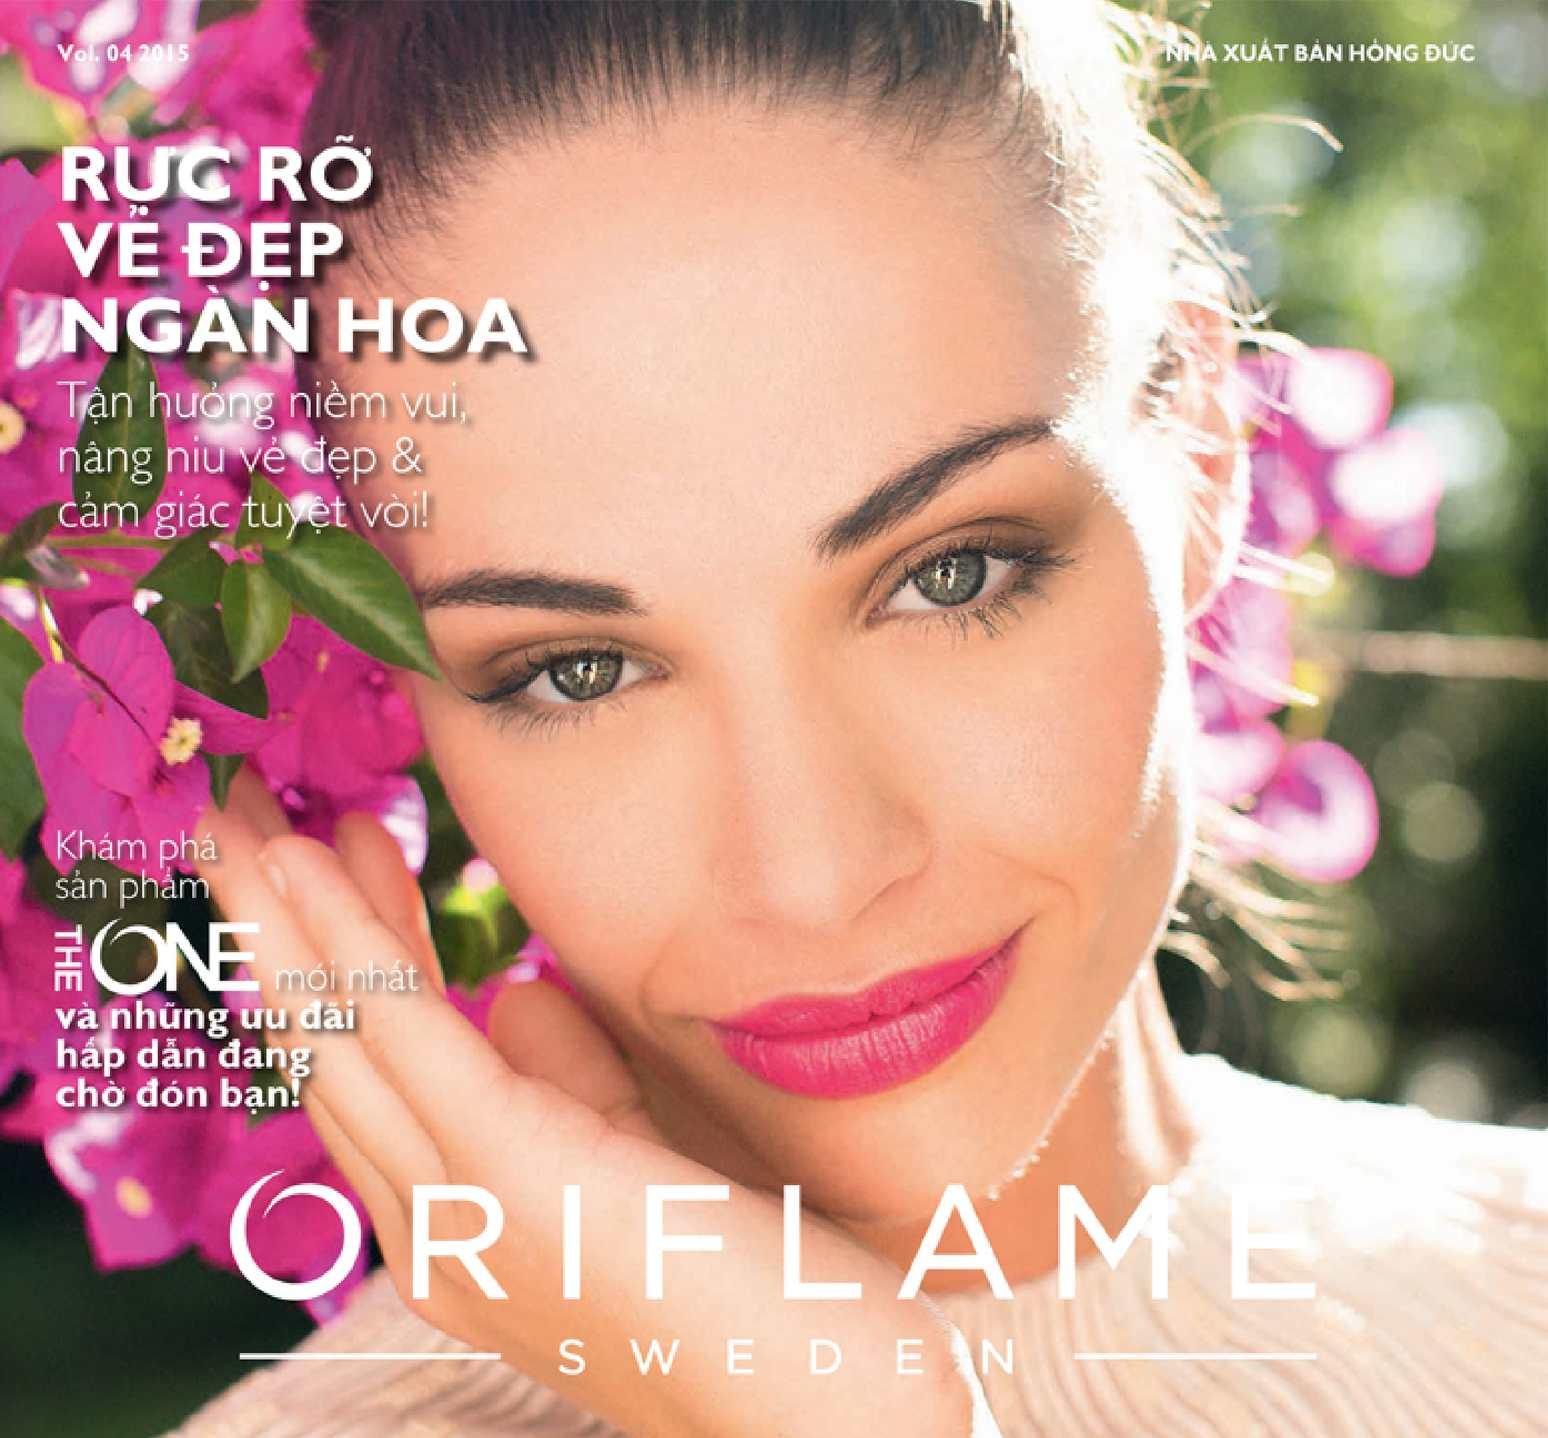 Catalogue My Pham Oriflame 4-2015